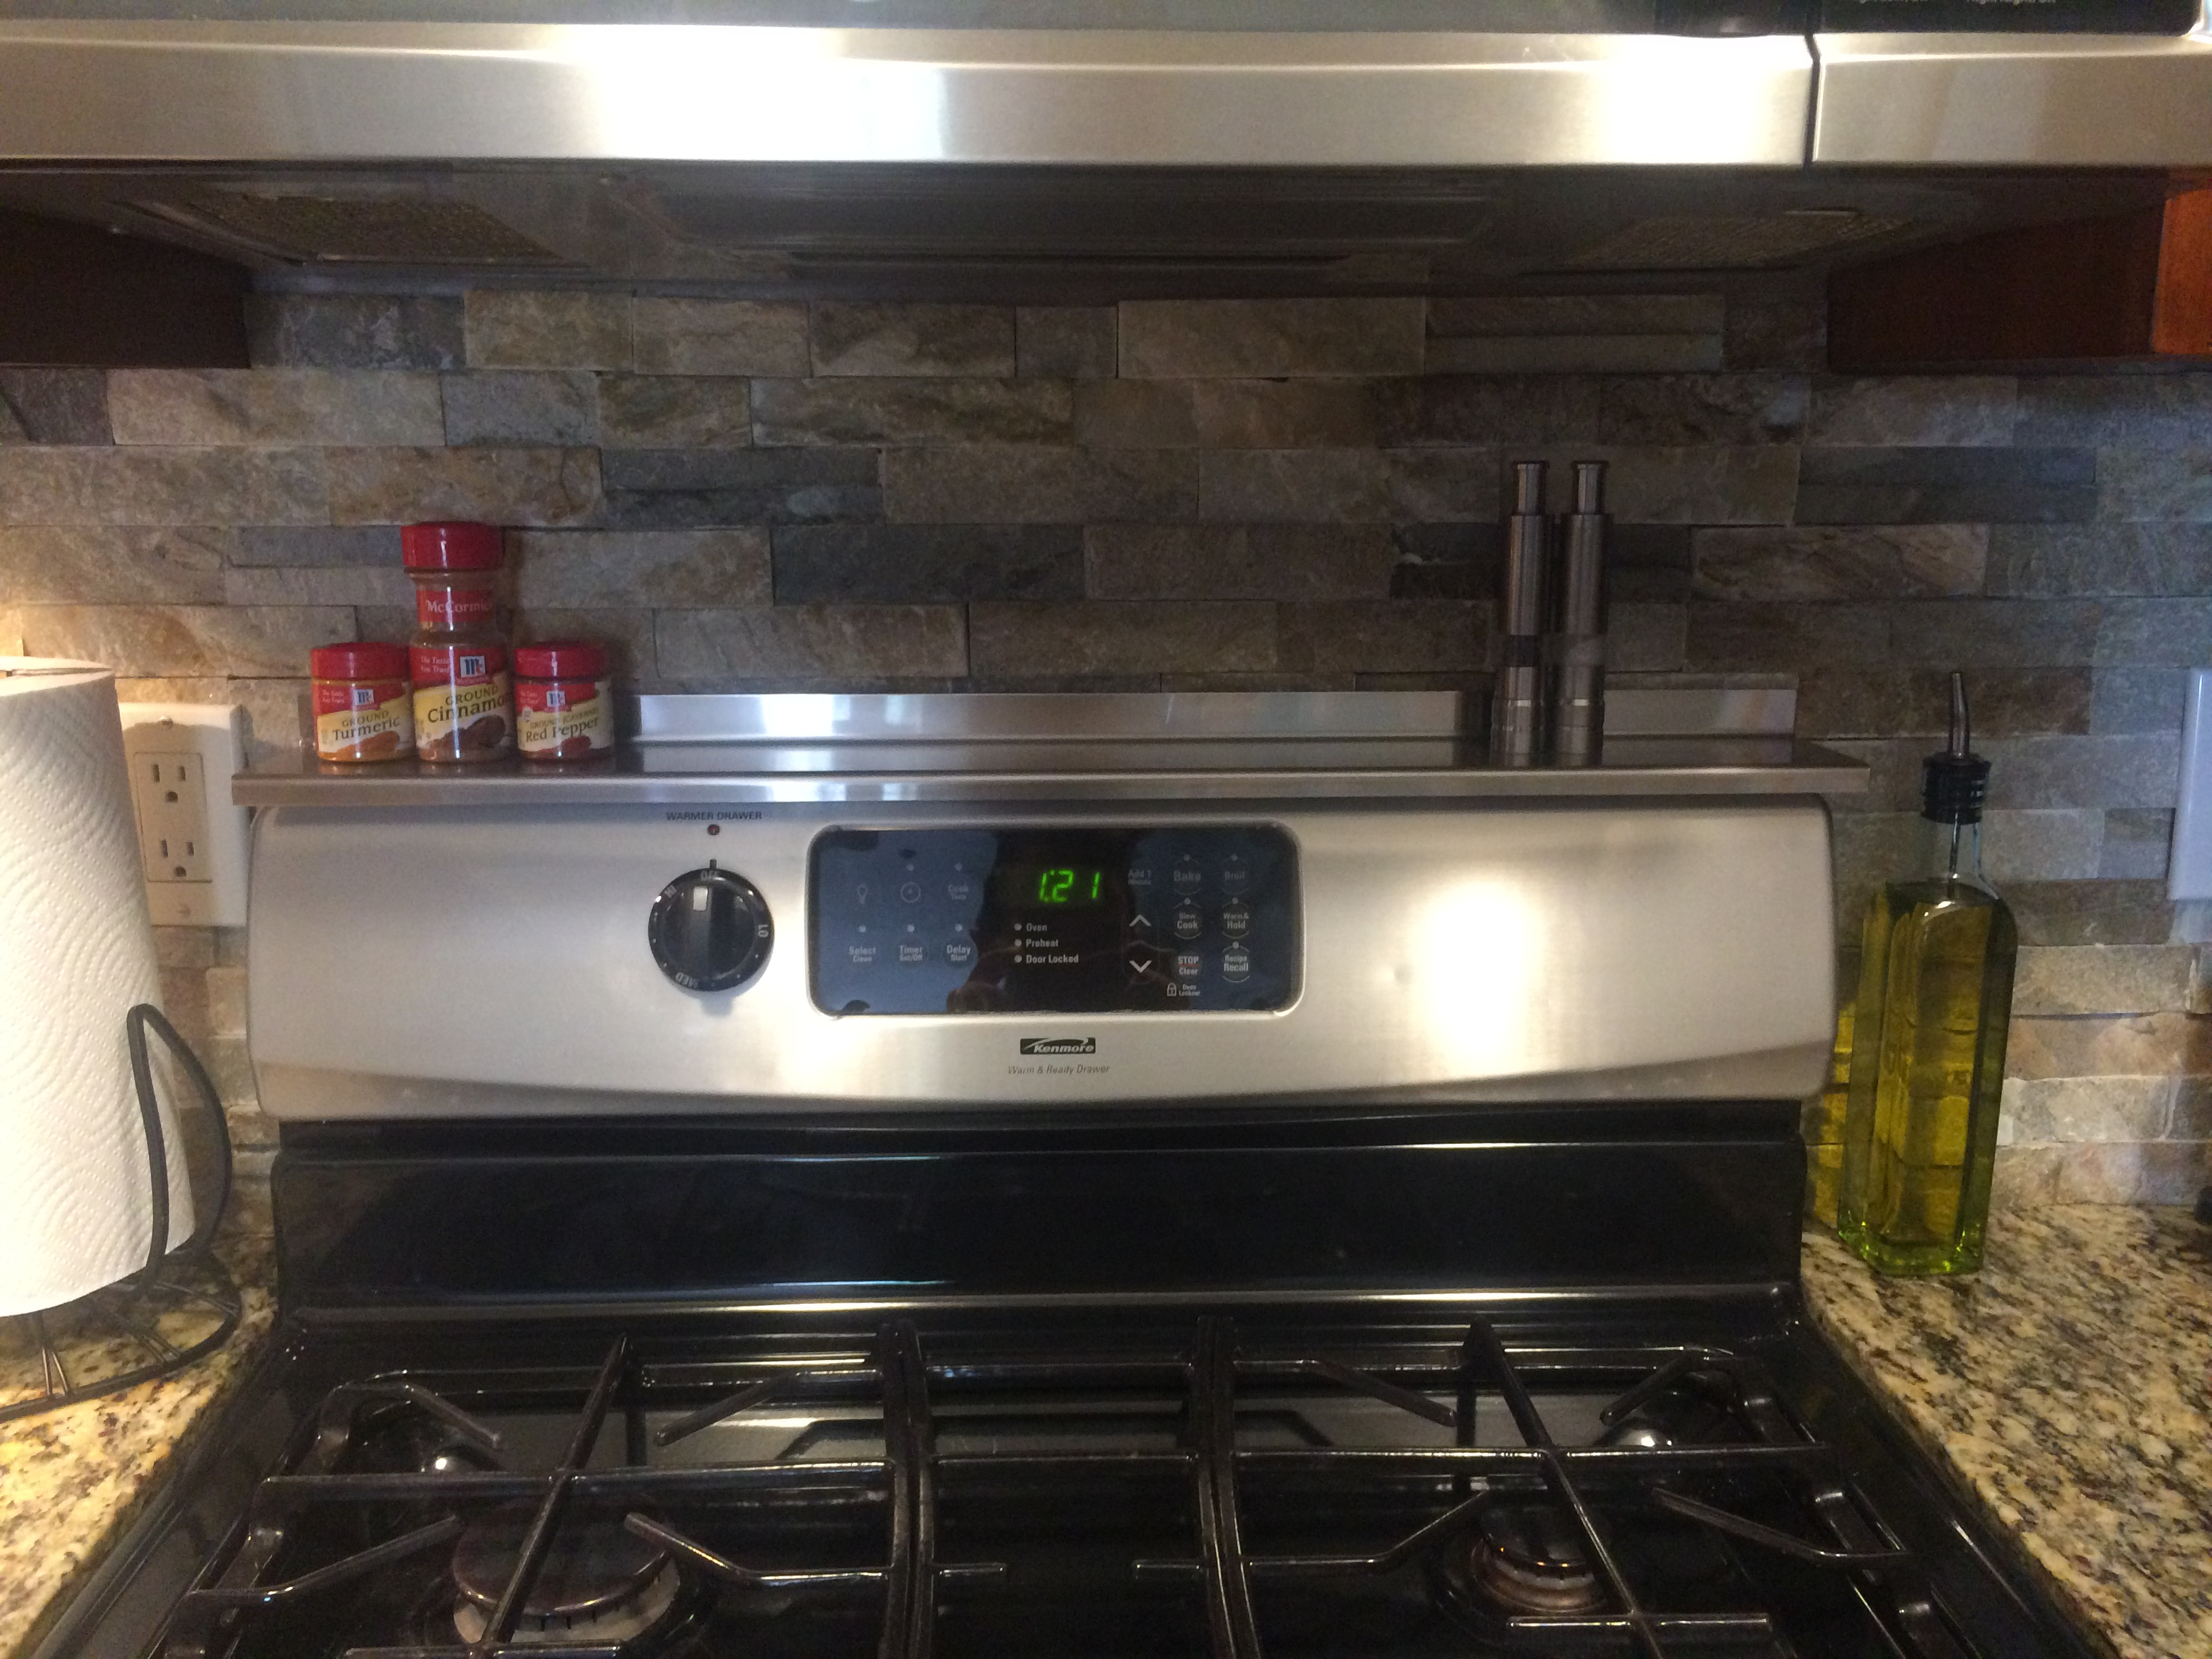 Stoveshelf Stainless 30 Quot Magnetic Shelf For Kitchen Stove